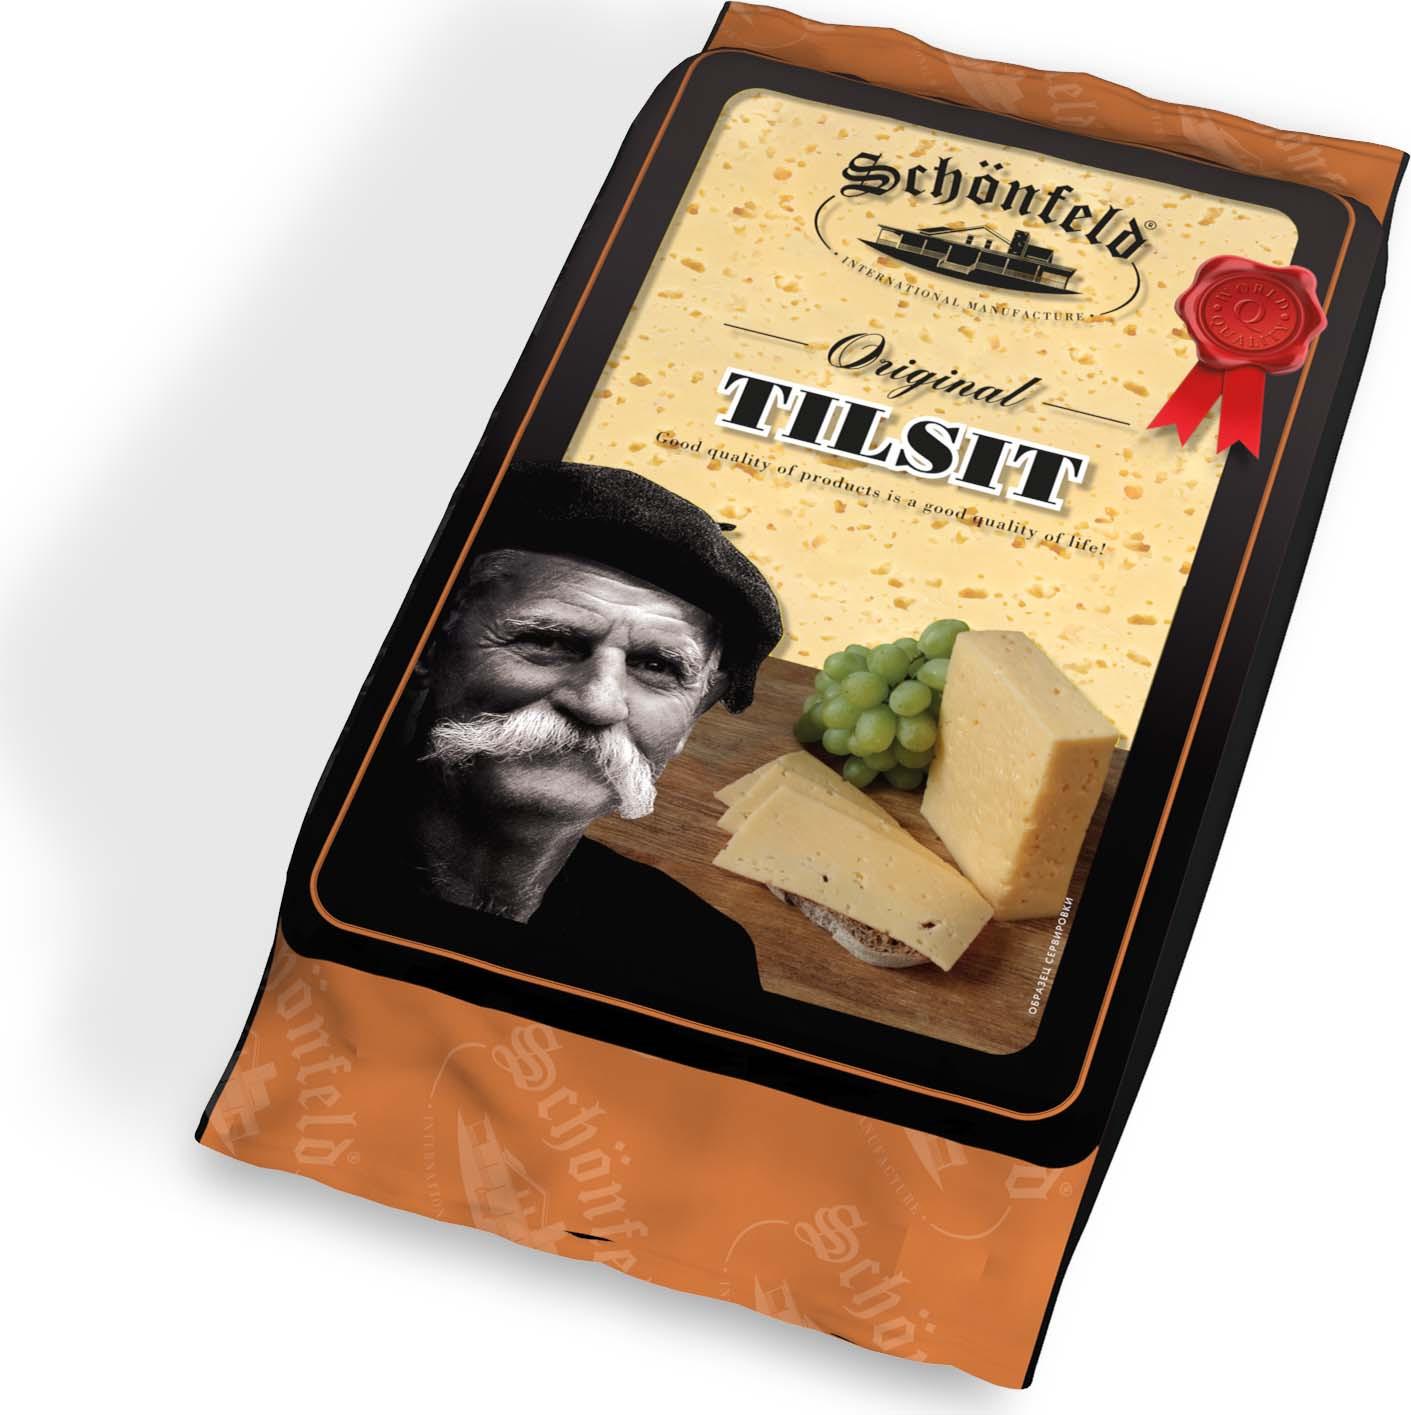 Сыр Schonfeld Тильзитер 45%, 250 г